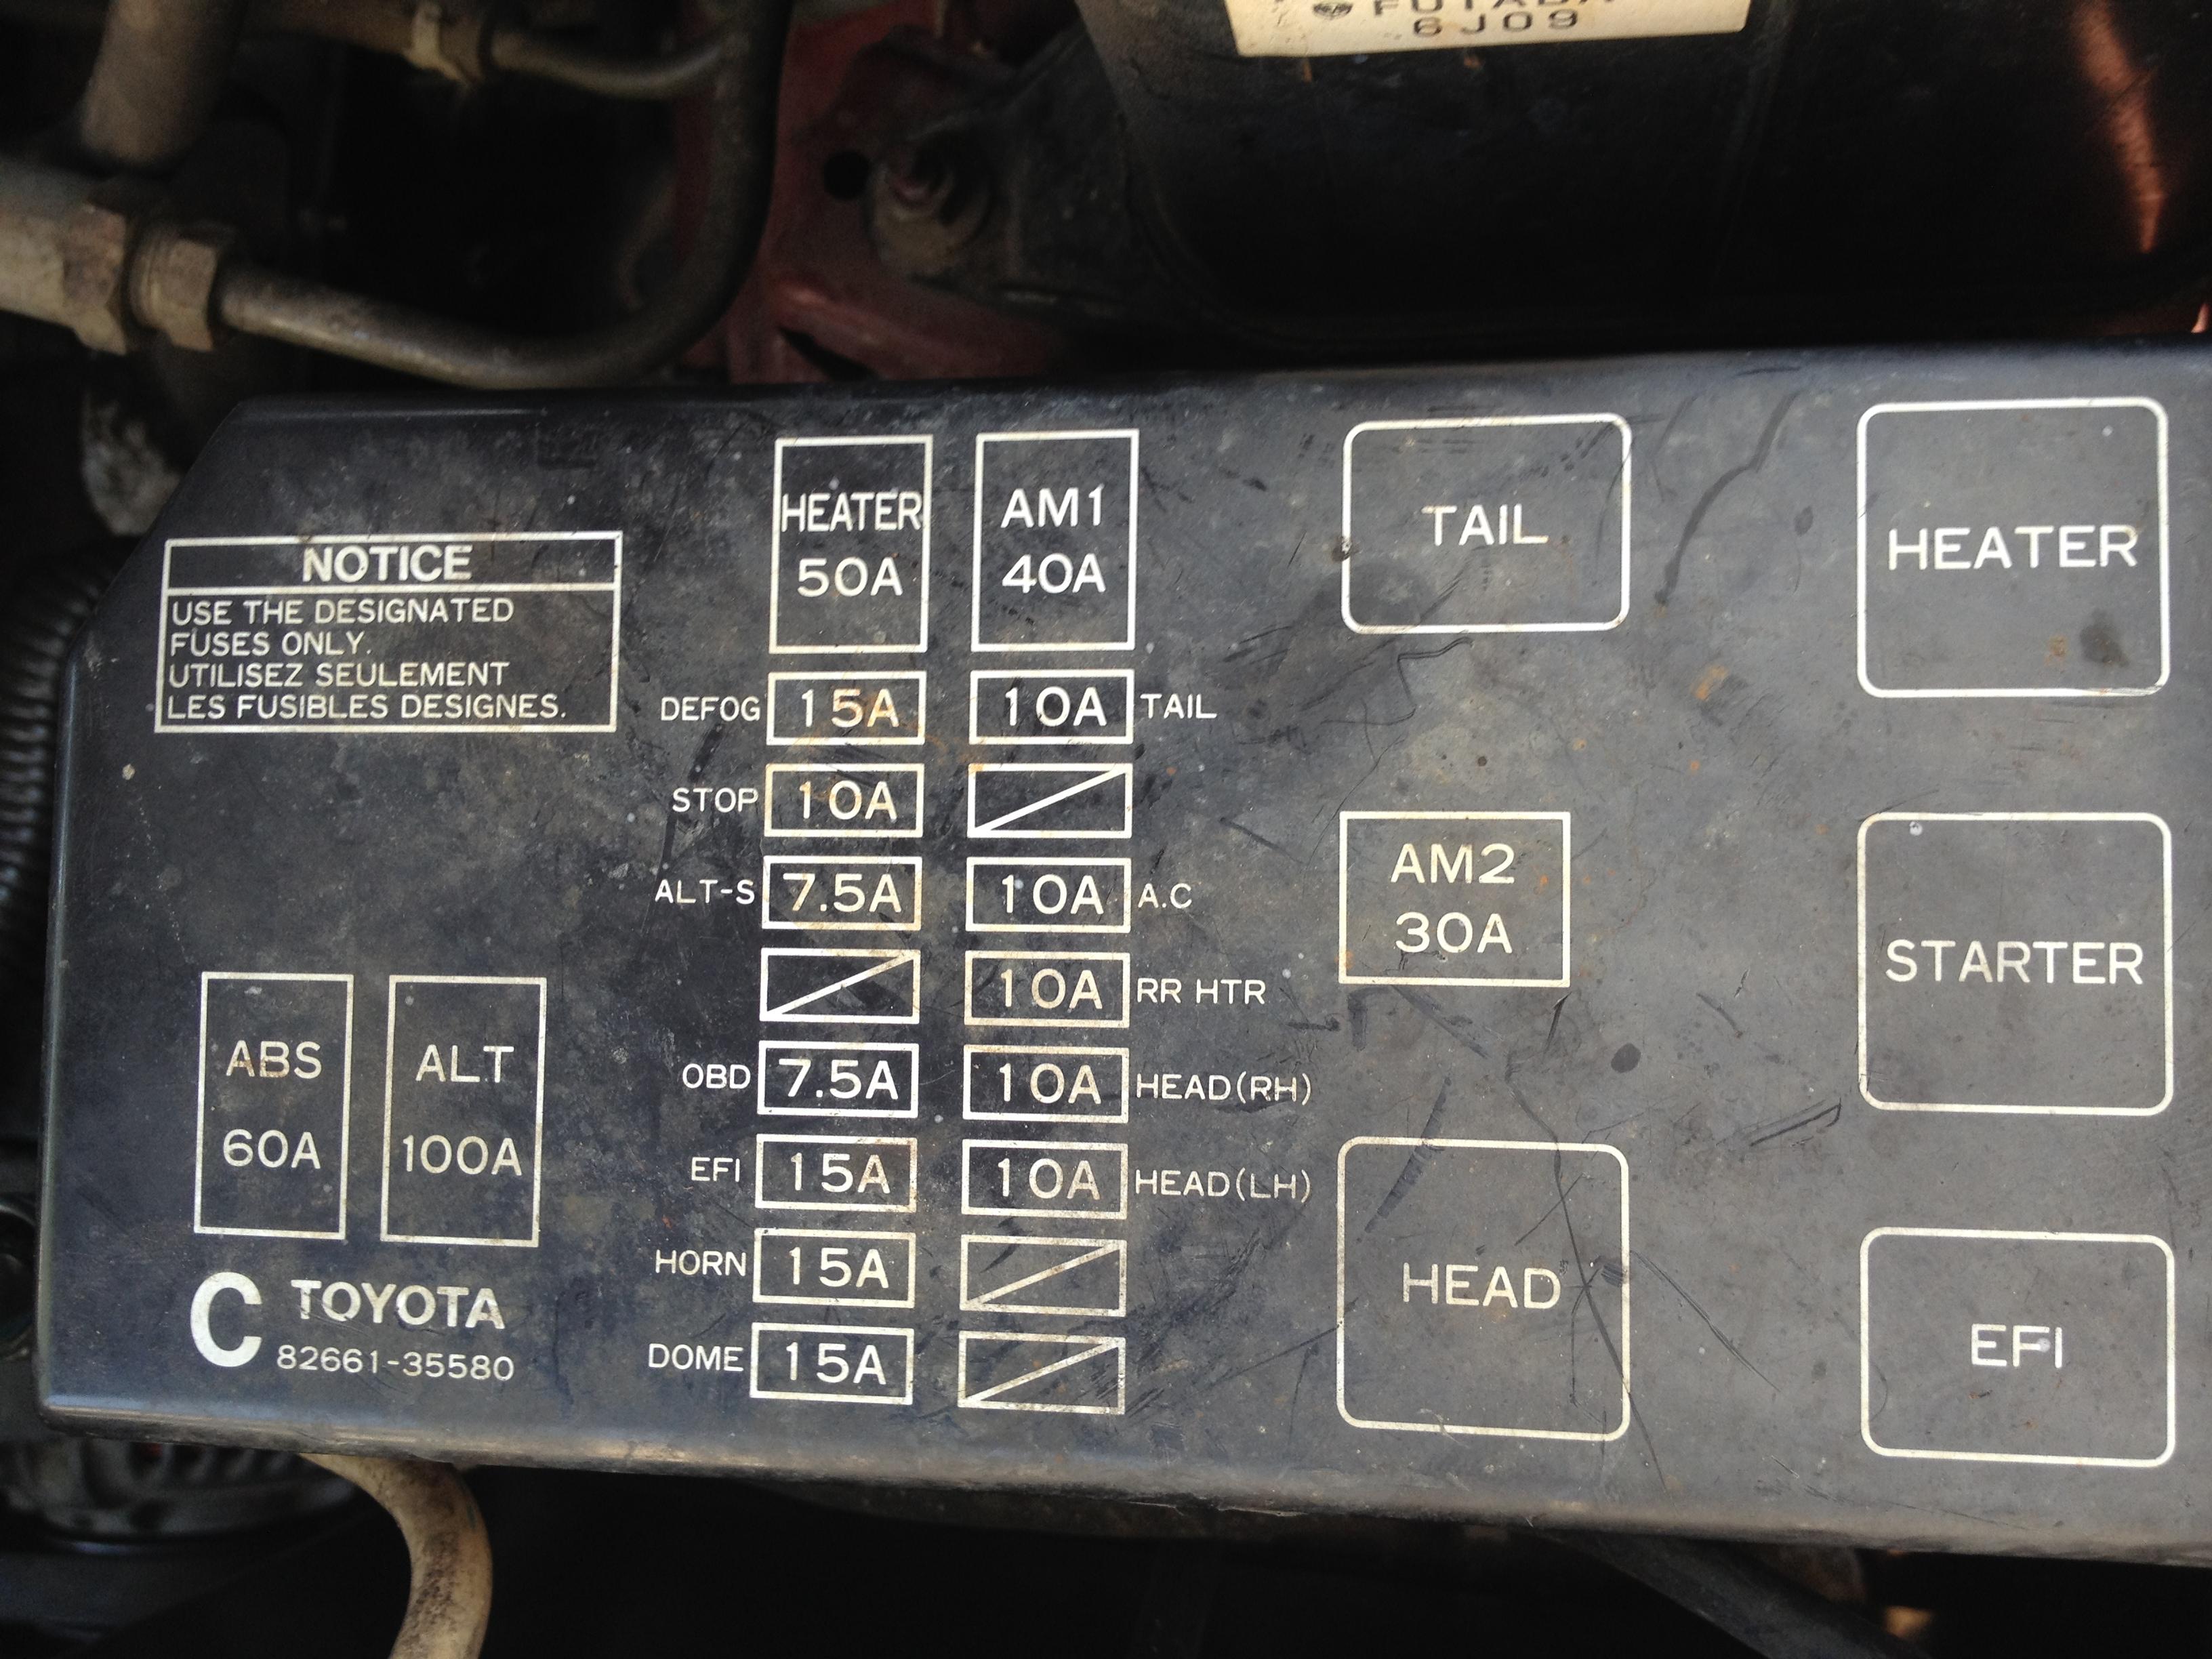 1995 Toyota Tacoma Fuse Box - Wiring Diagram Data hut-adjust -  hut-adjust.portorhoca.it | 1997 Toyota Tacoma Fuse Box |  | portorhoca.it